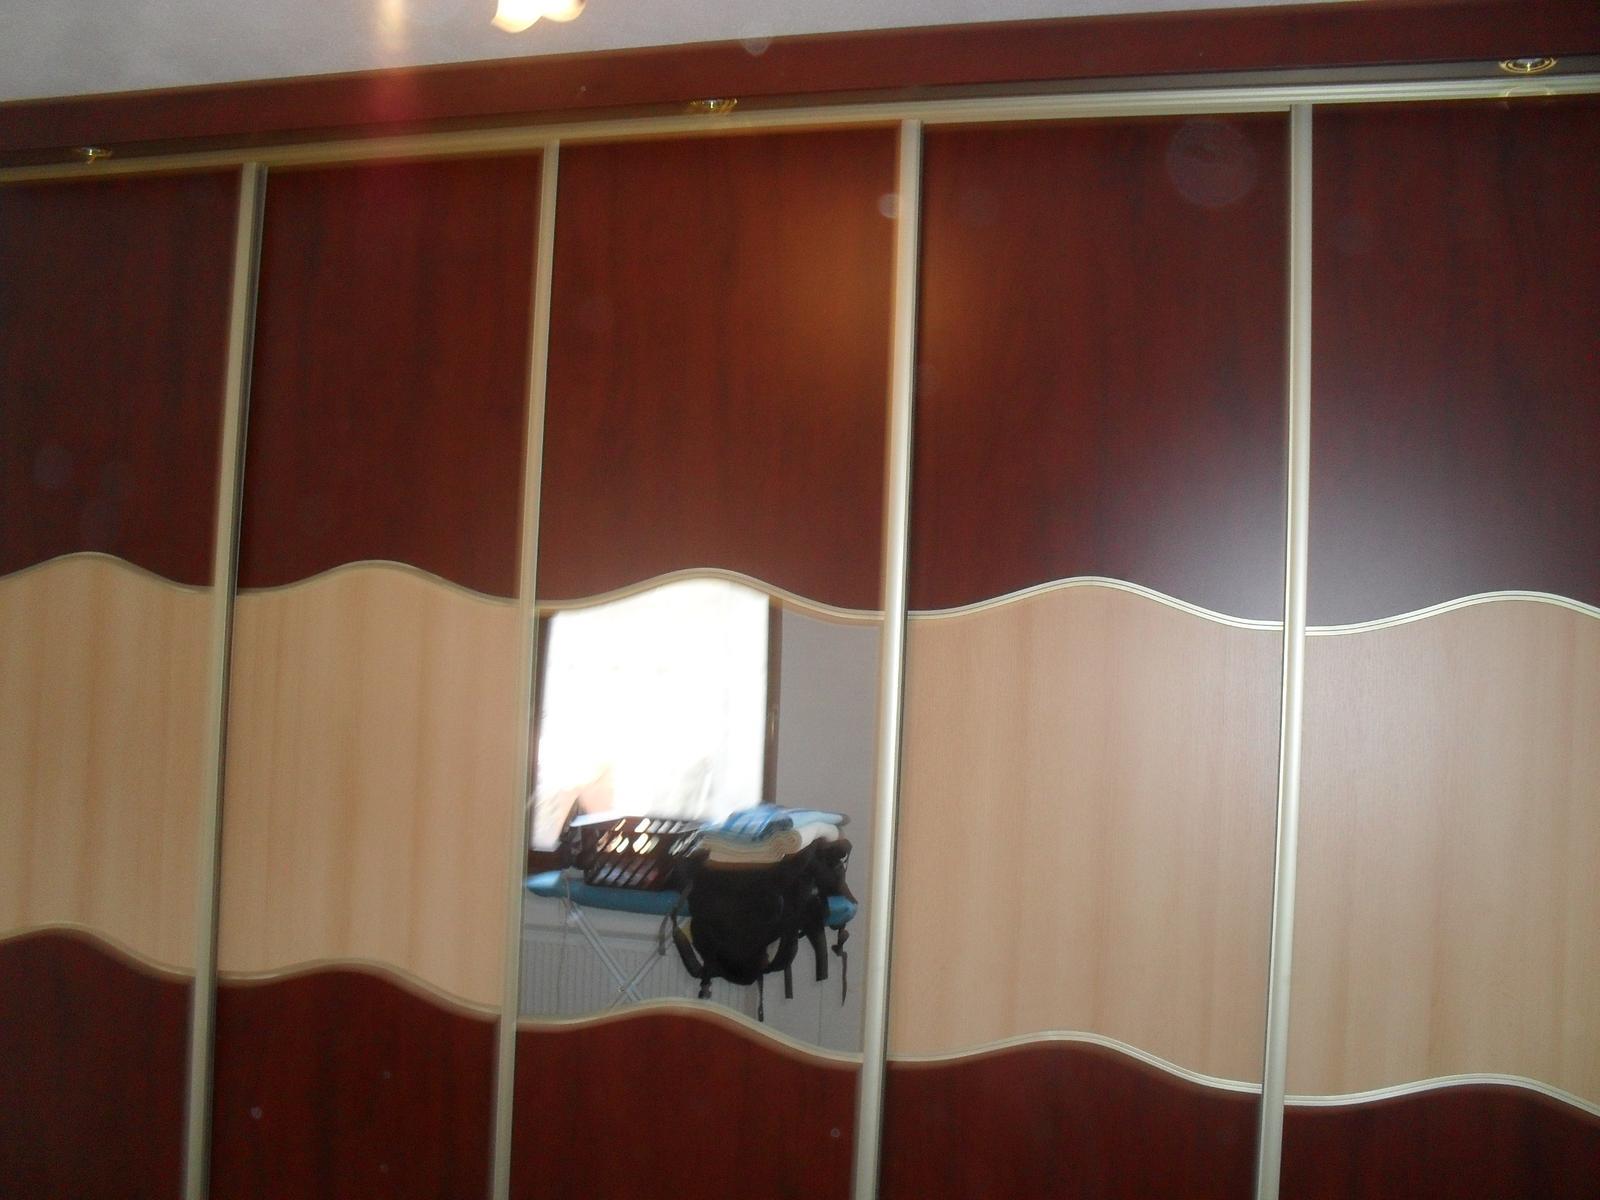 Vstavané skrine Martin Benko Bošany - Obrázok č. 20